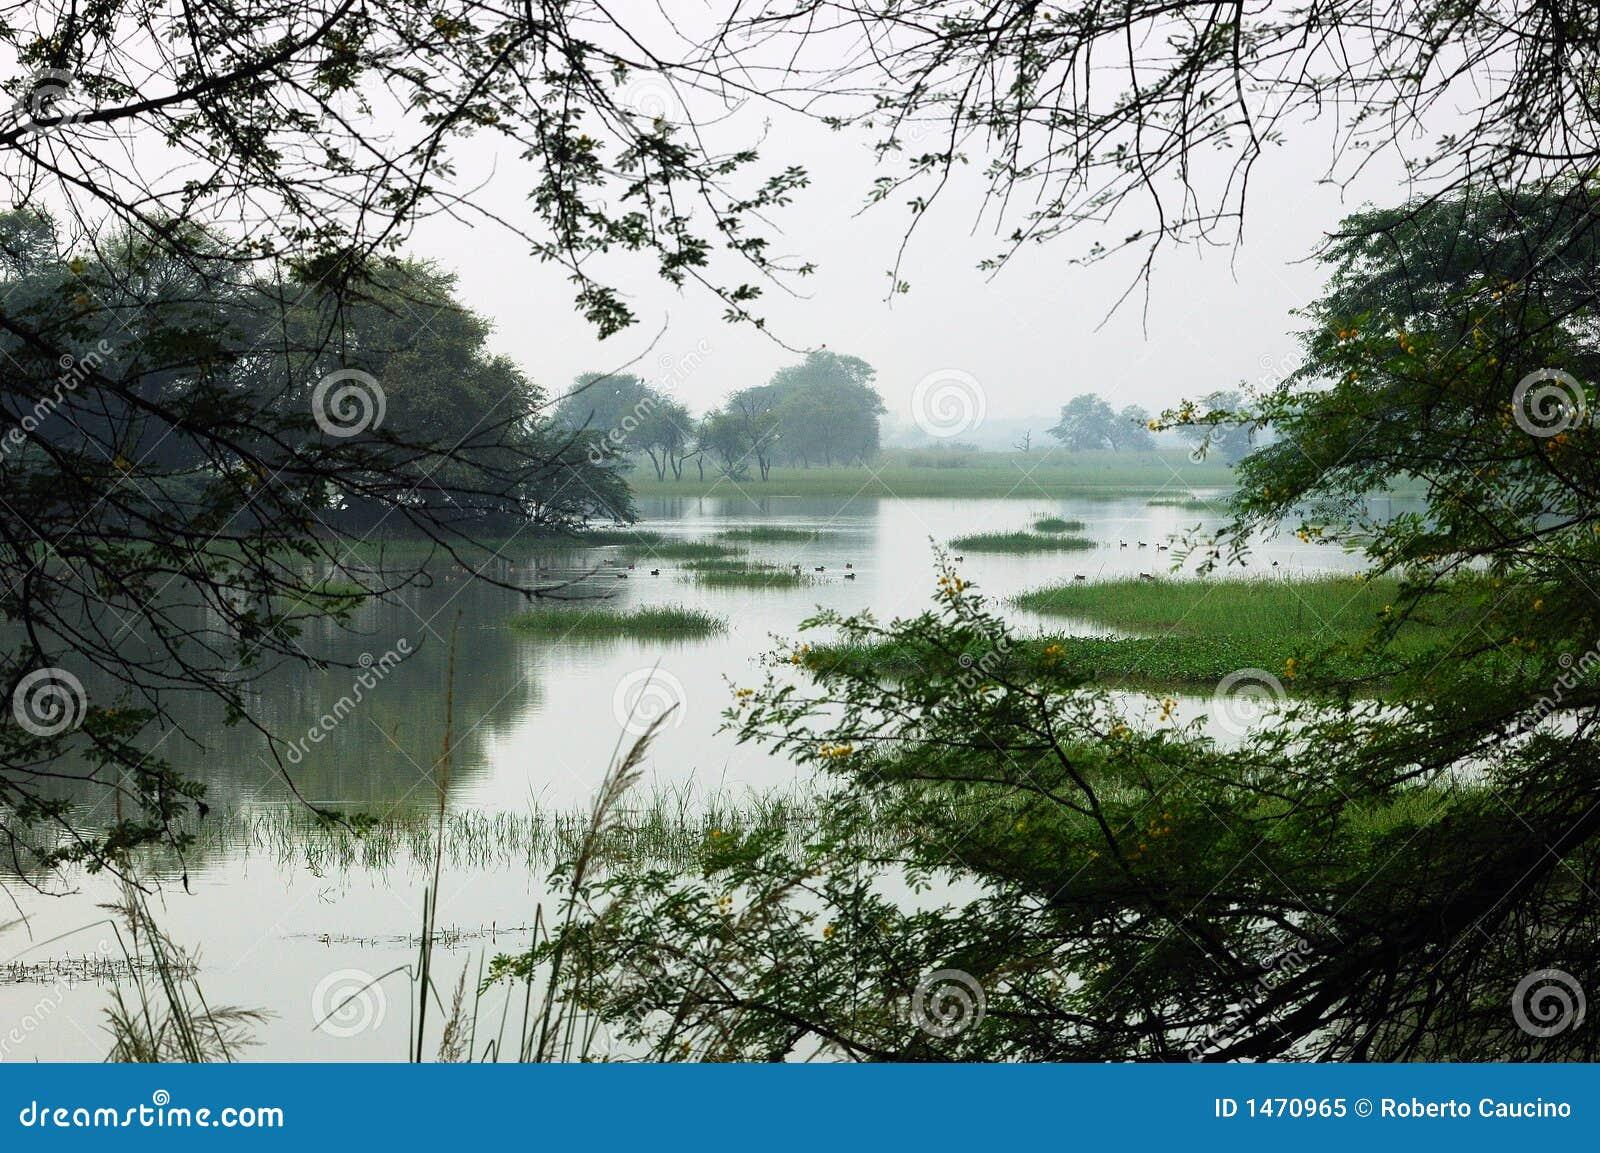 India sultanpur